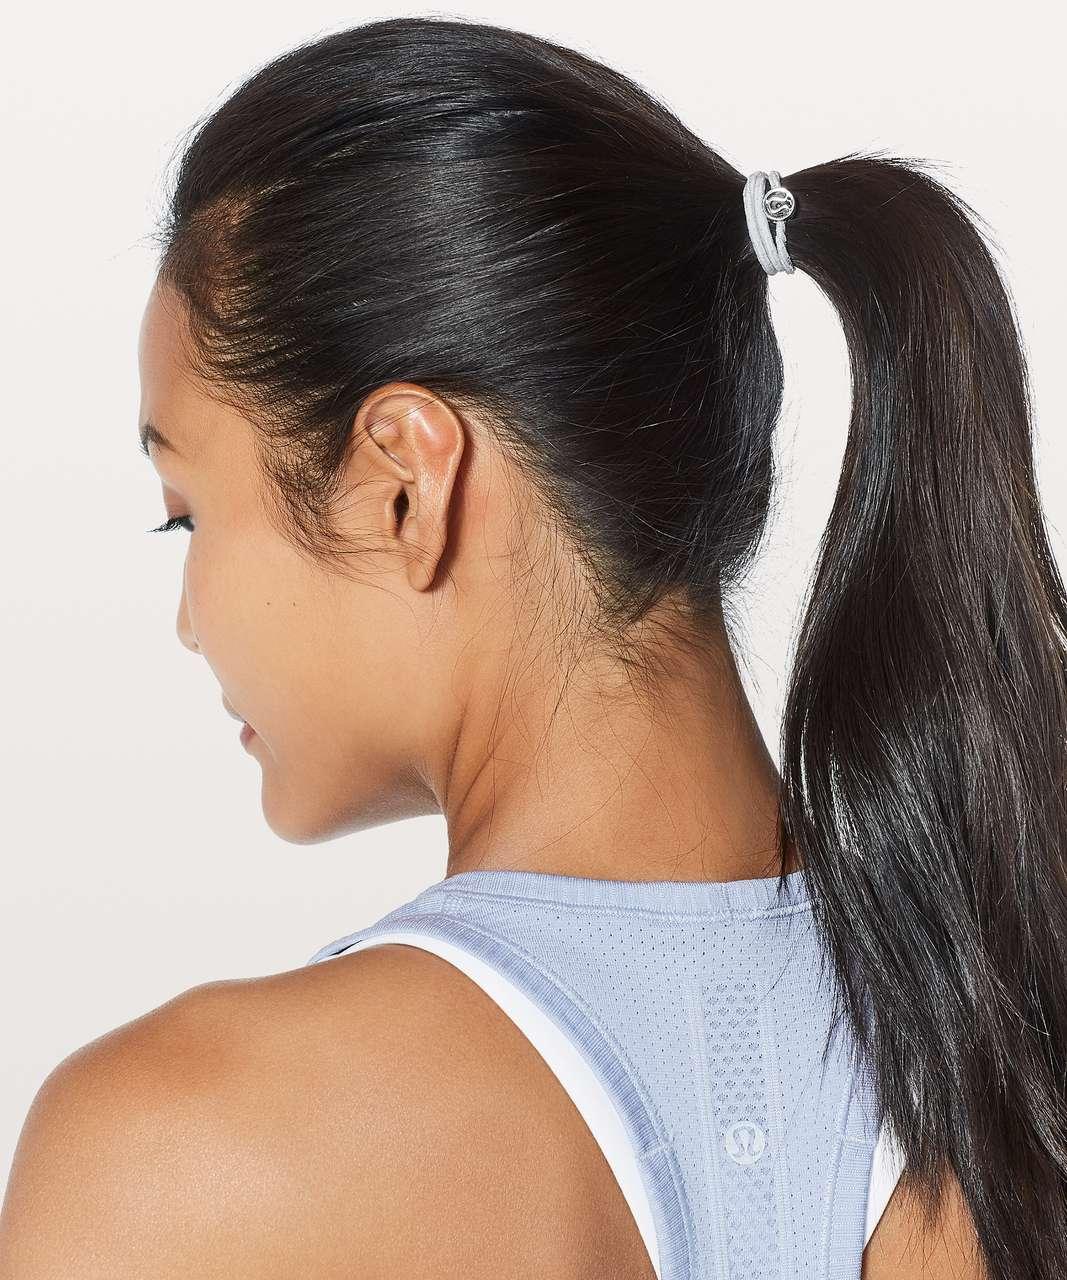 Lululemon Glow On Hair Ties - Black / Nebula / Silver Fox